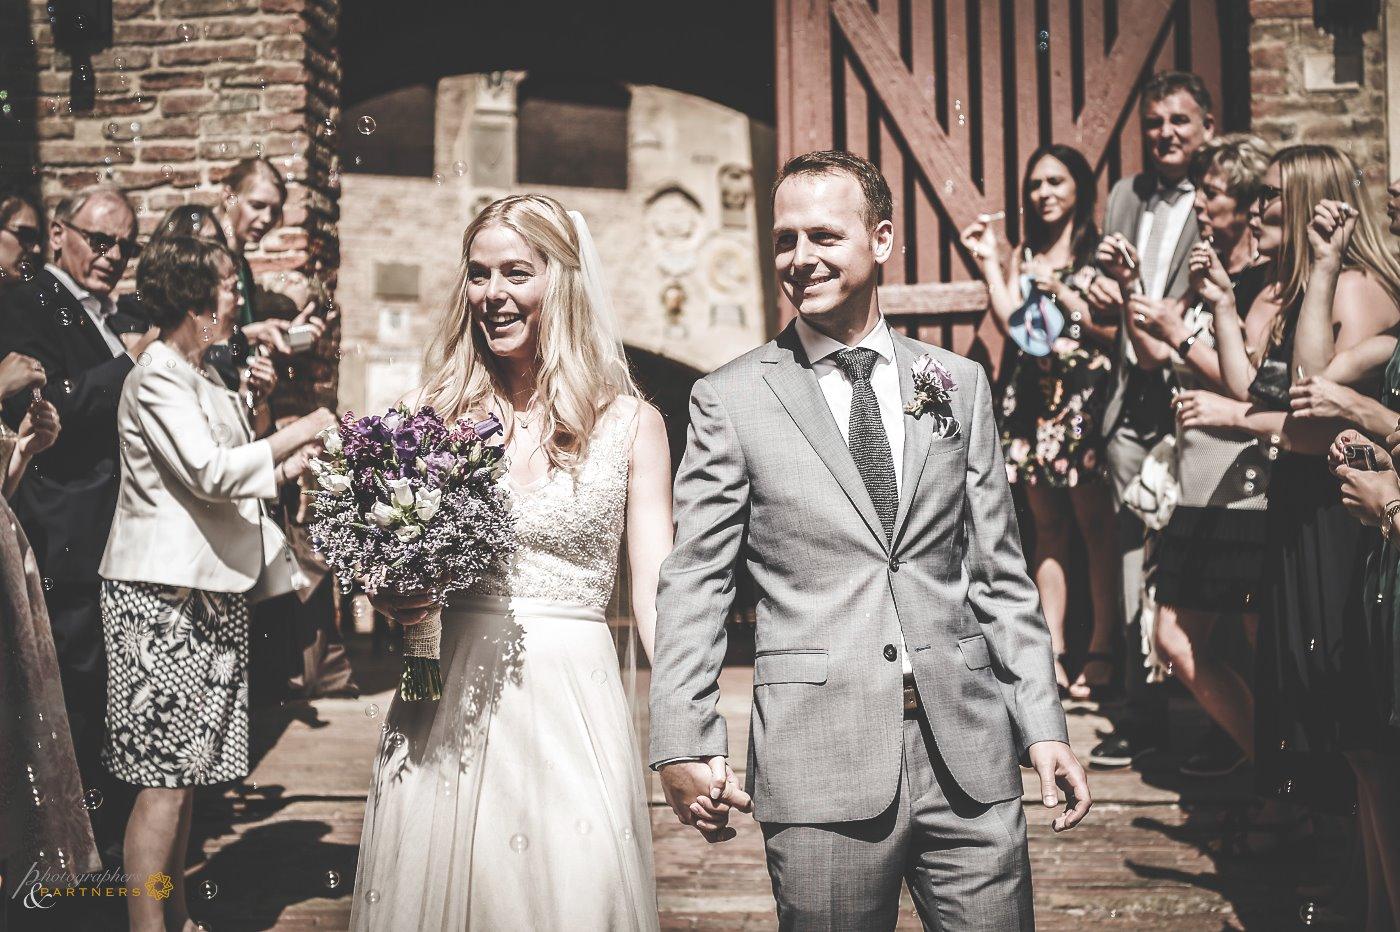 photographers_weddings_certaldo_11.jpg